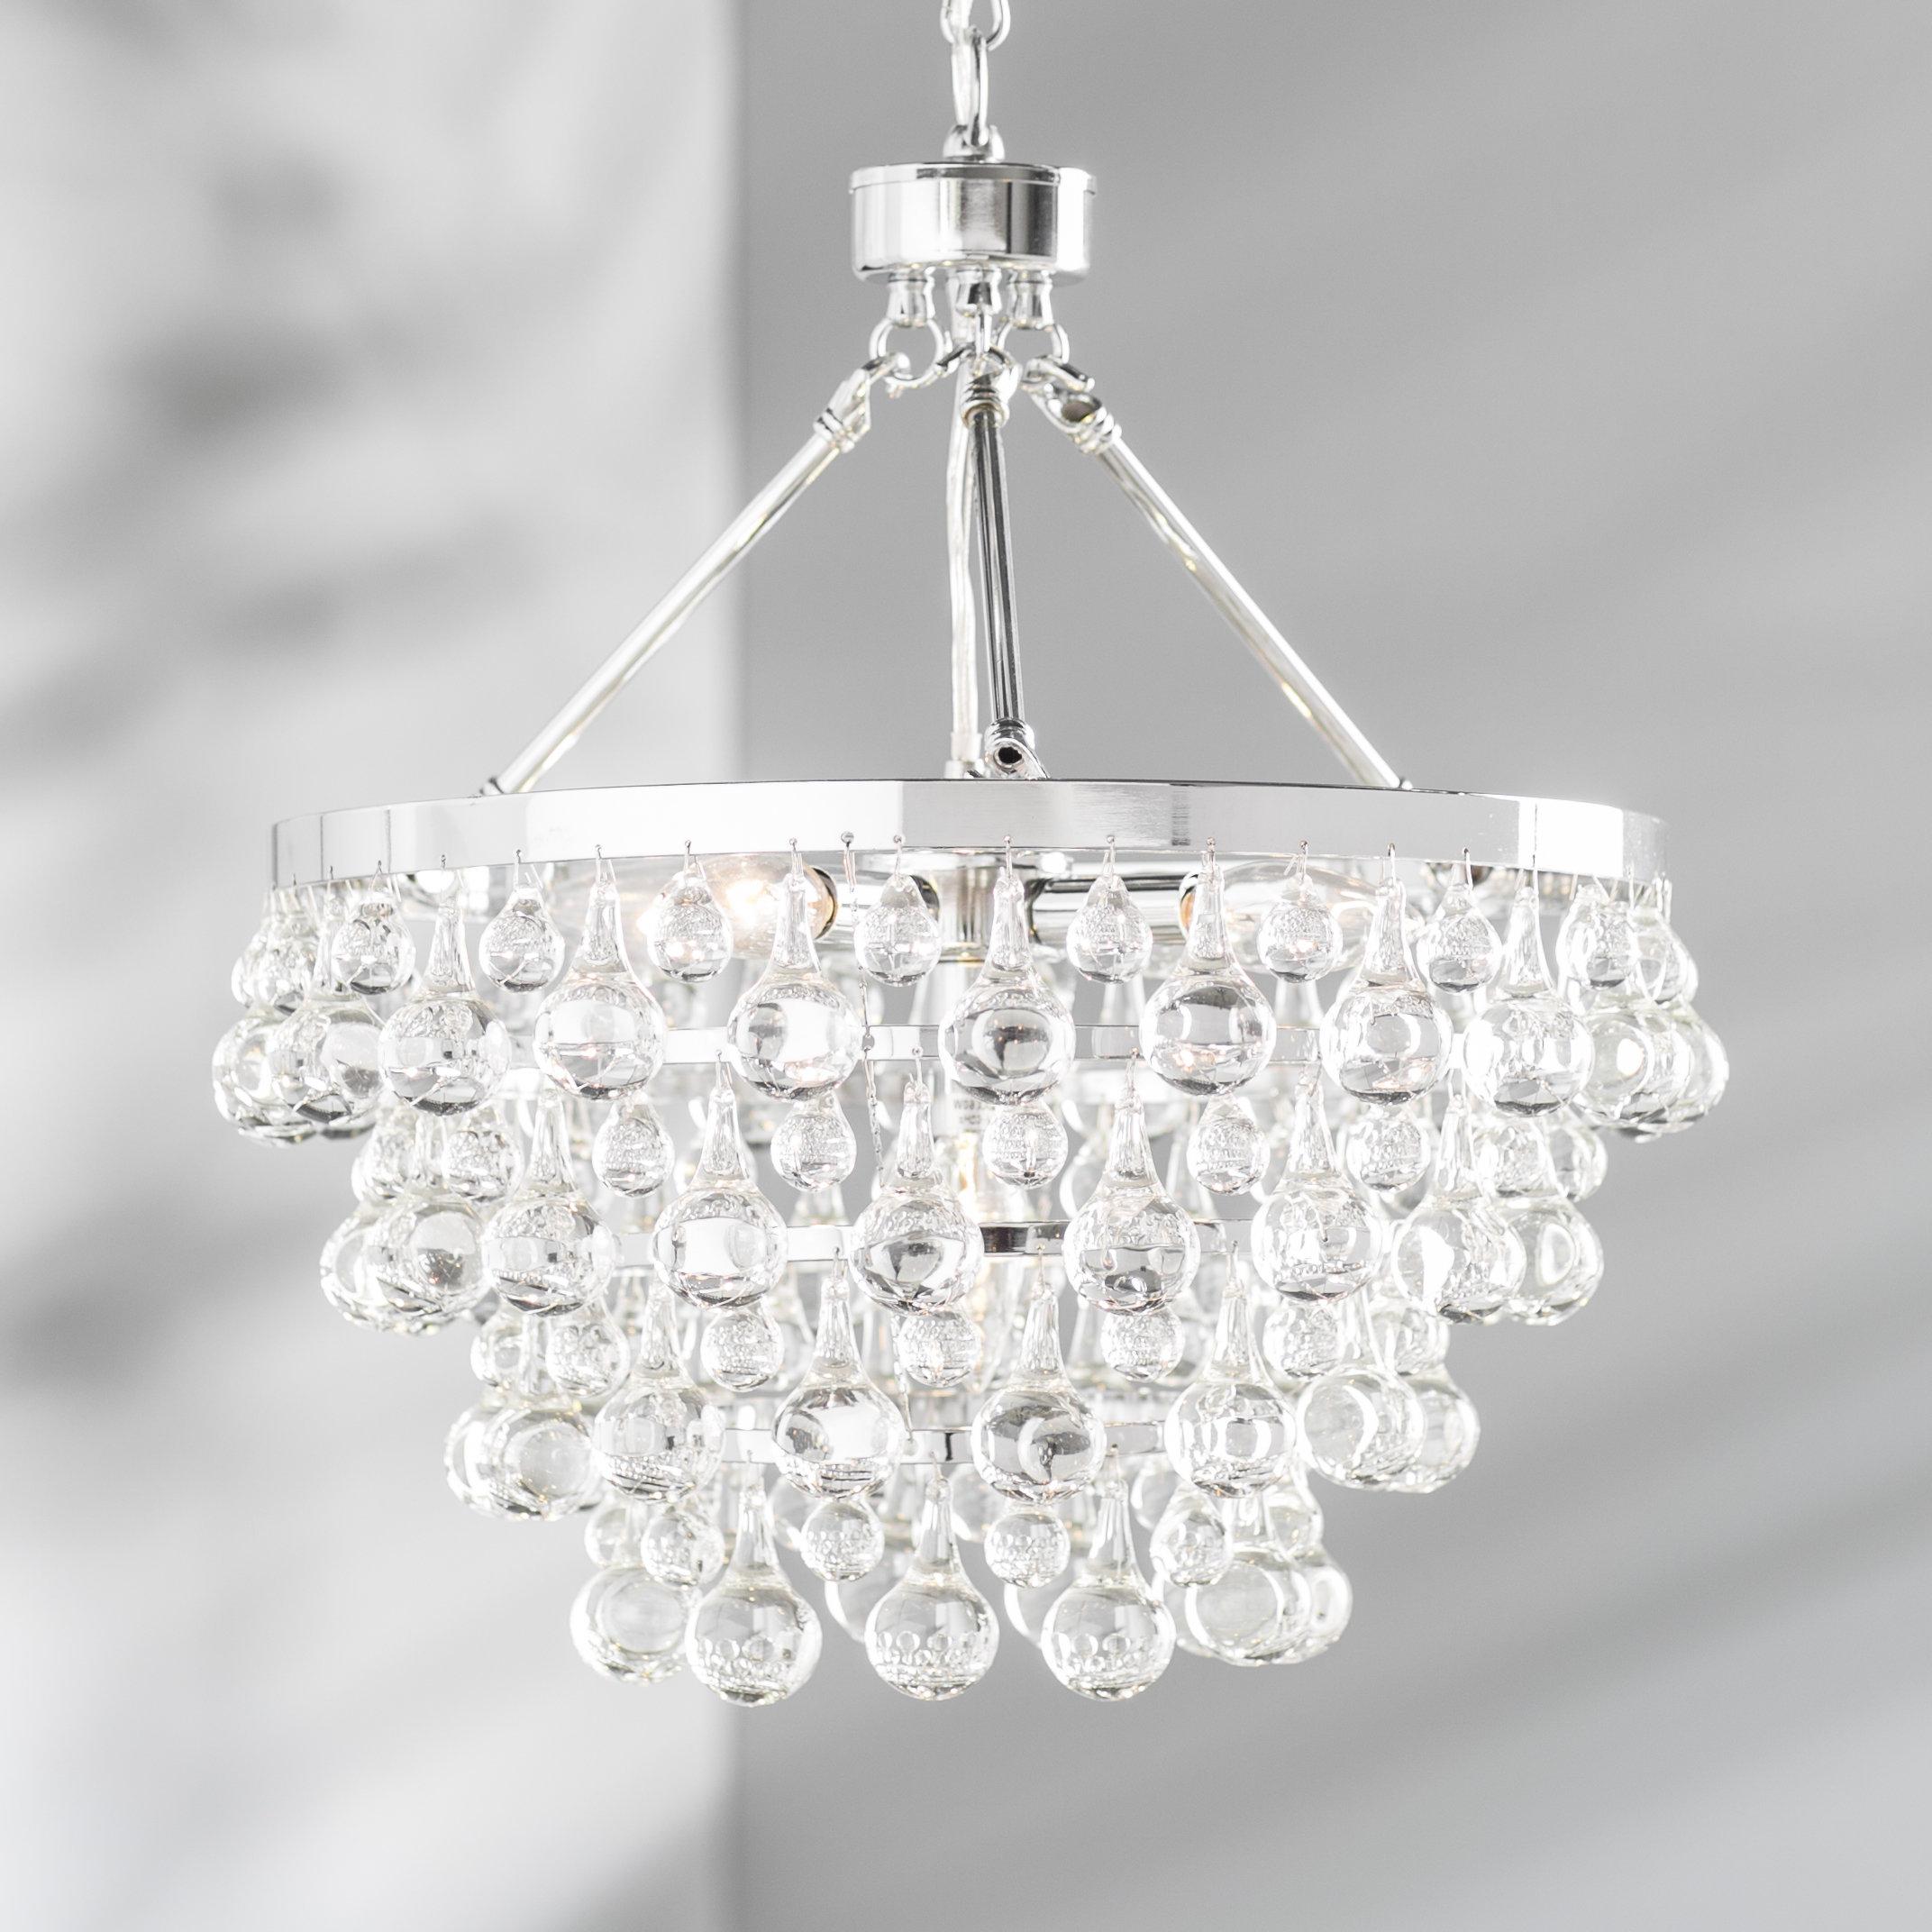 Ahern 5 Light Crystal Chandelier Regarding Most Recently Released Verdell 5 Light Crystal Chandeliers (View 6 of 25)